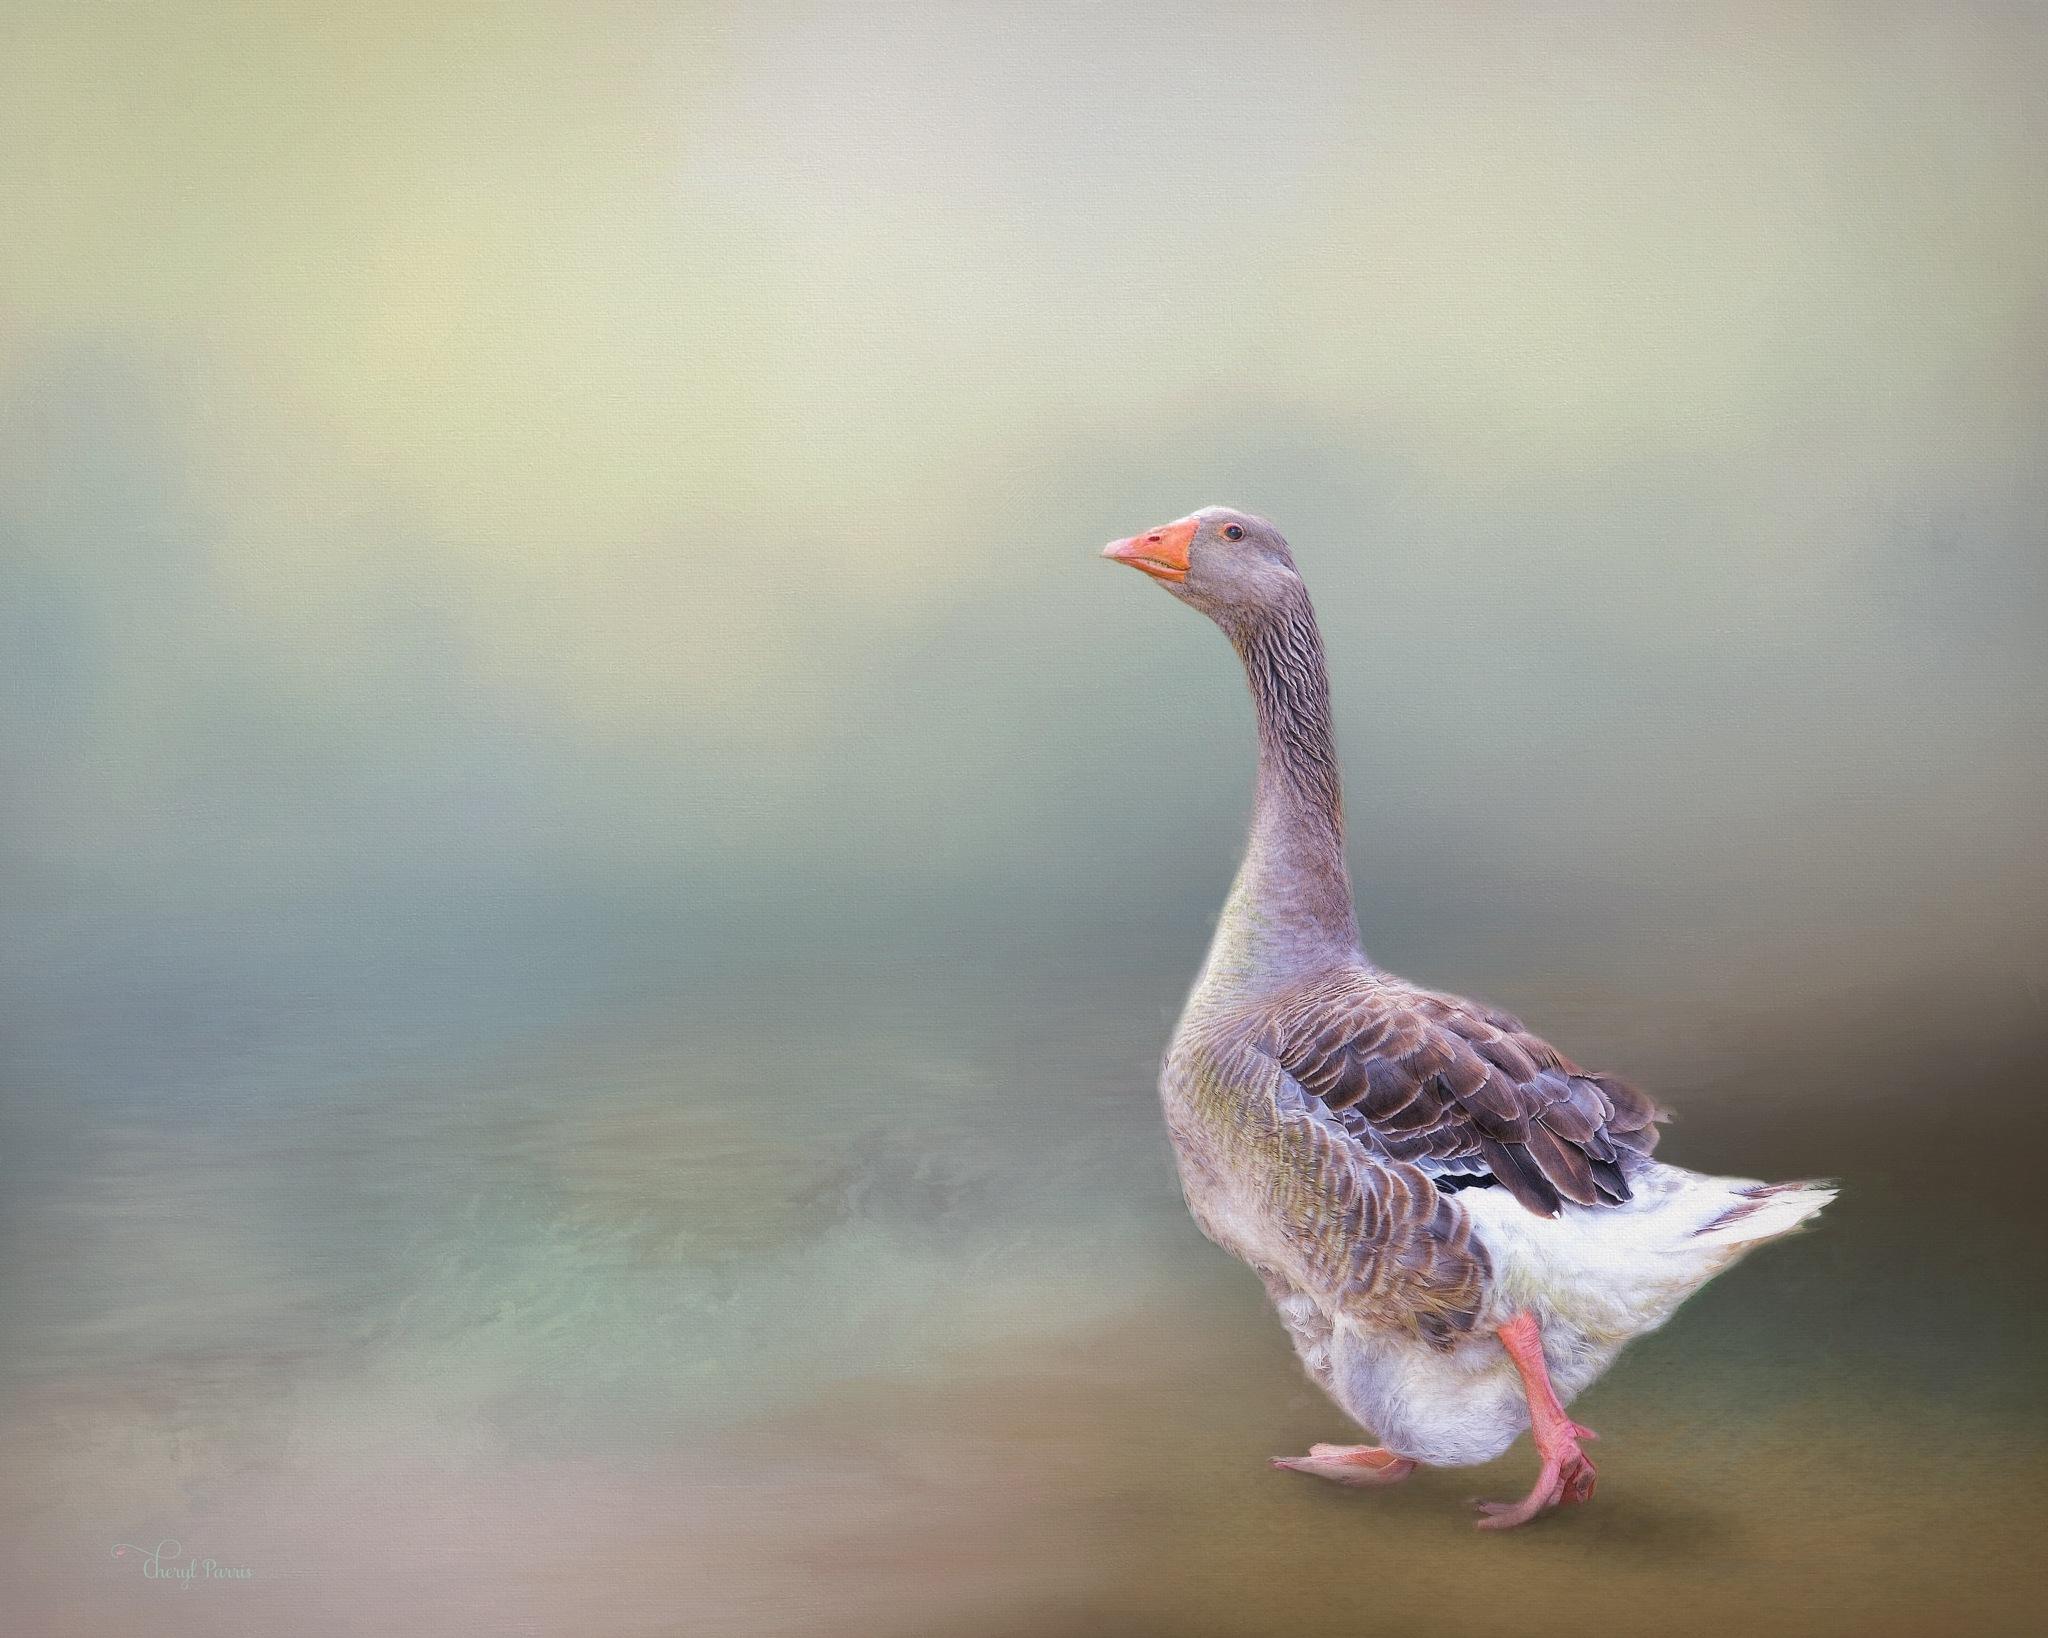 Goose Strolling Along by Cherbeni